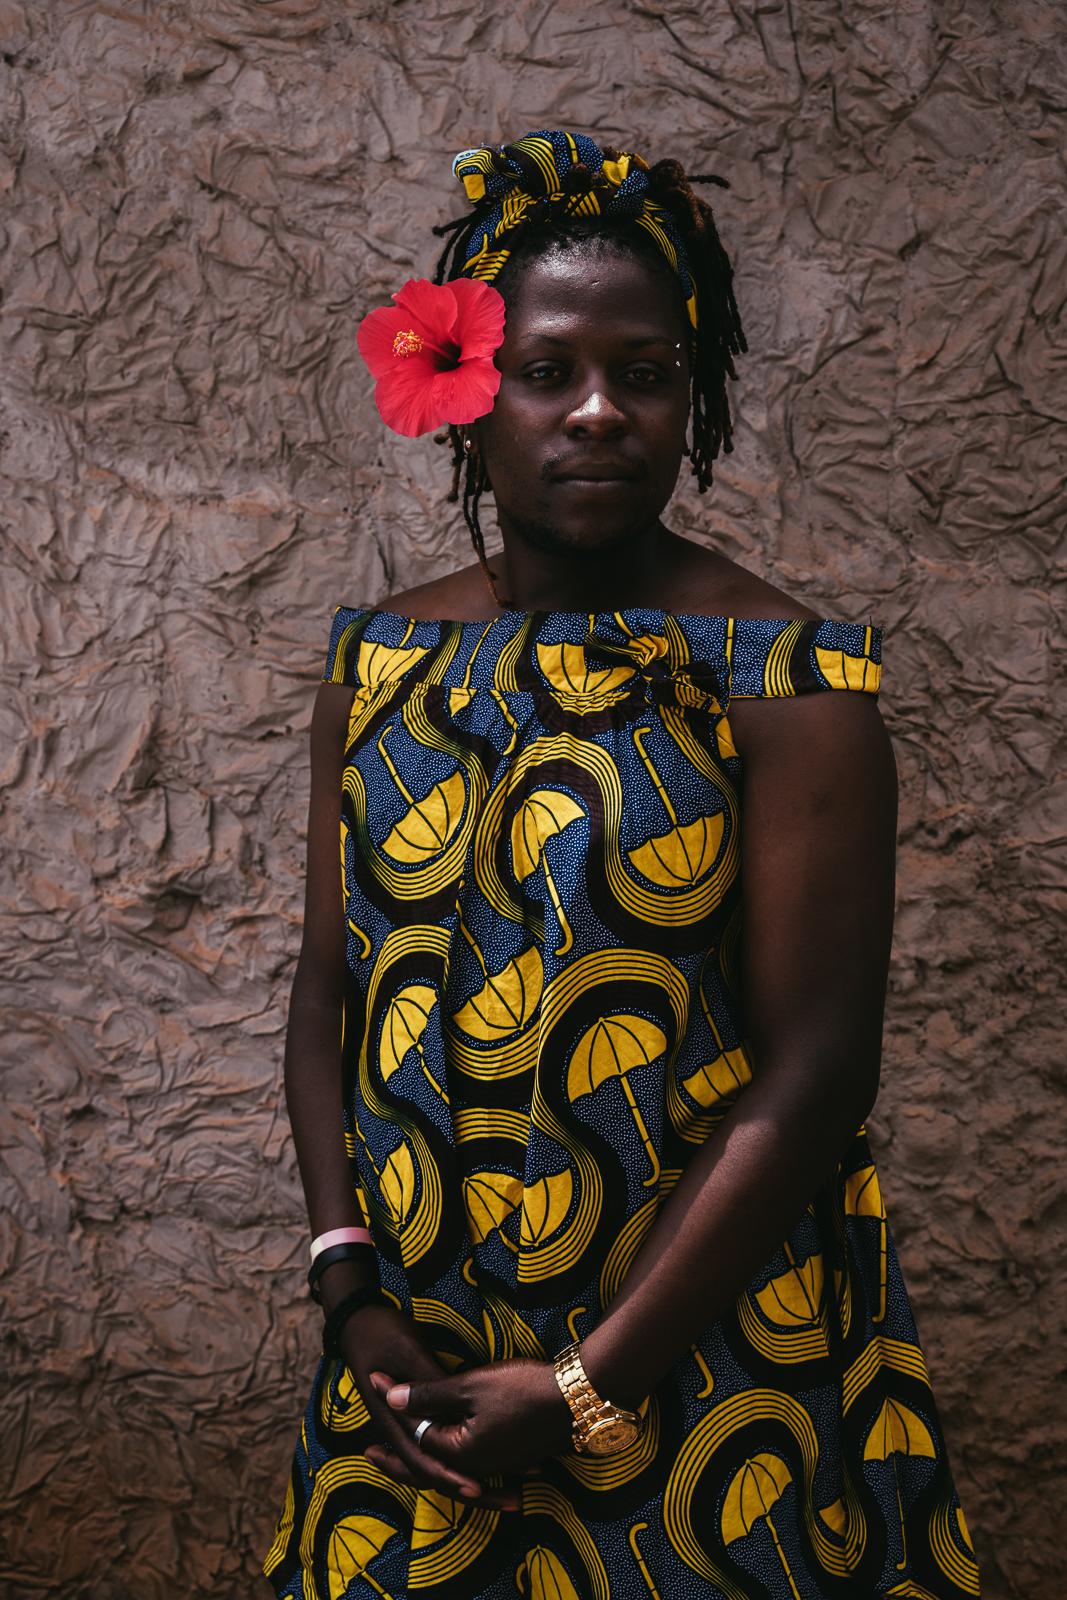 Queer_RebeccaRuetten_Uganda_Keem_web-08974.jpg